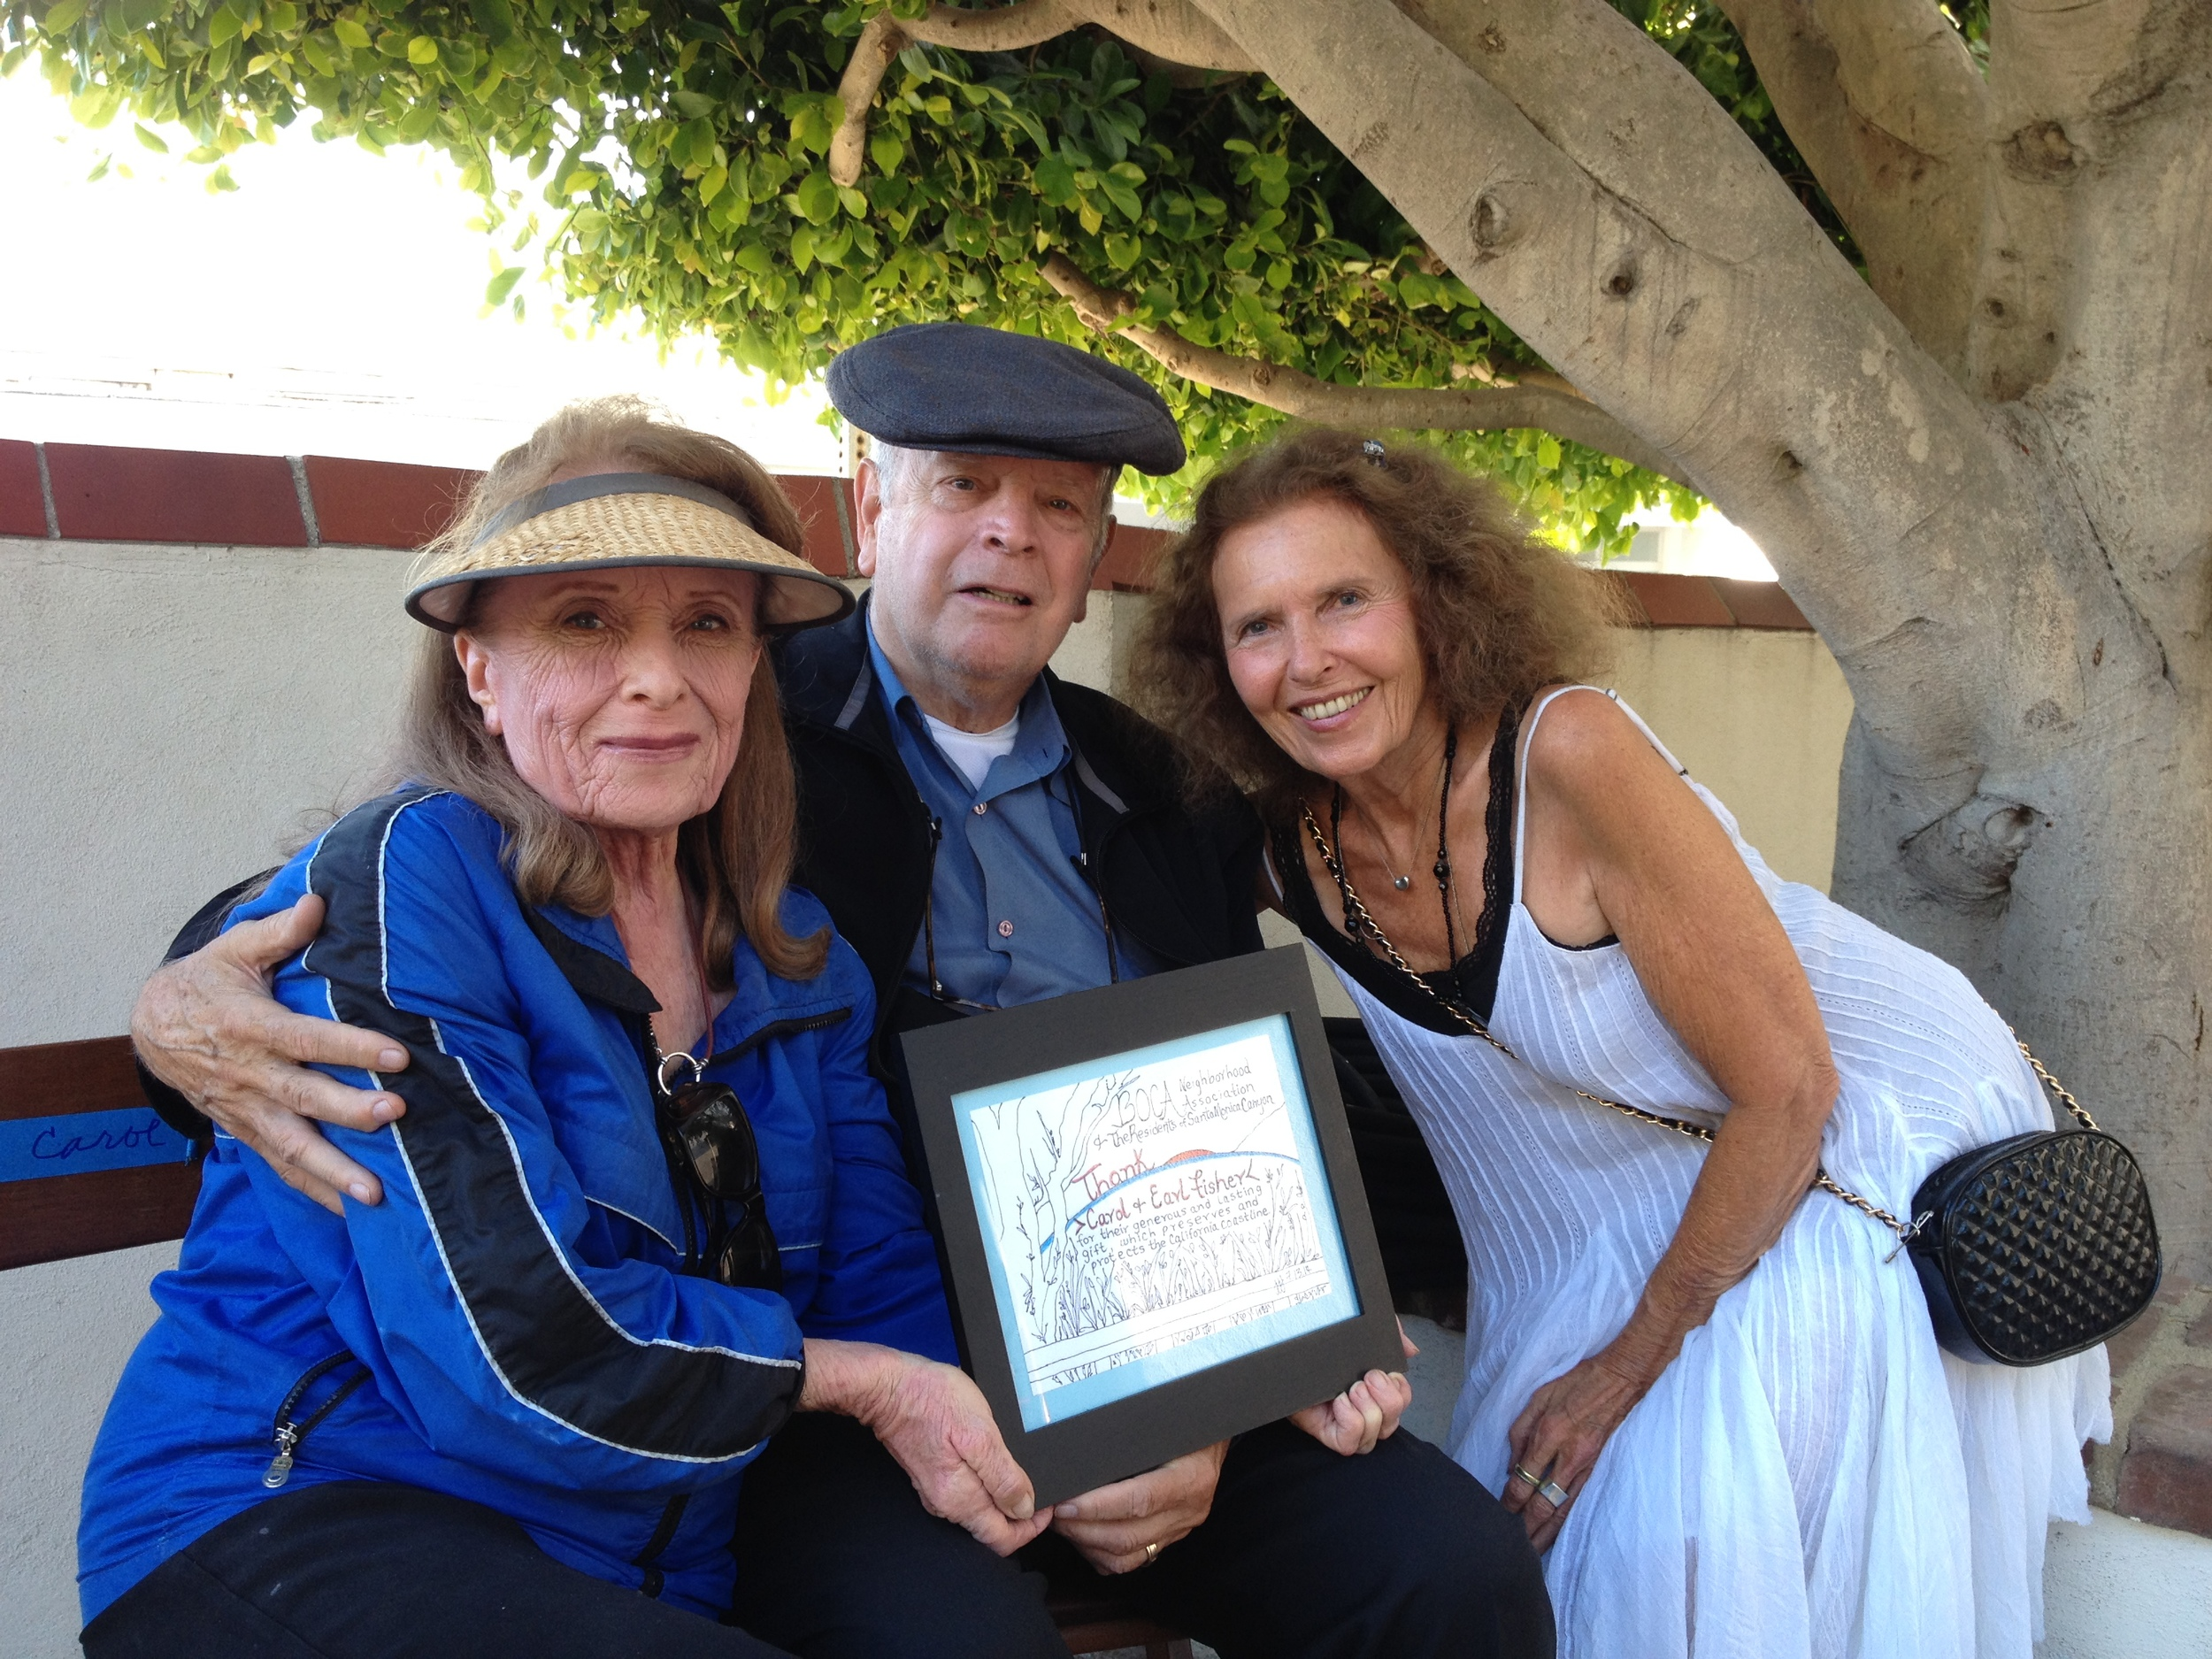 Carol and Earl Fisher receiving artwork from Judi Jensen